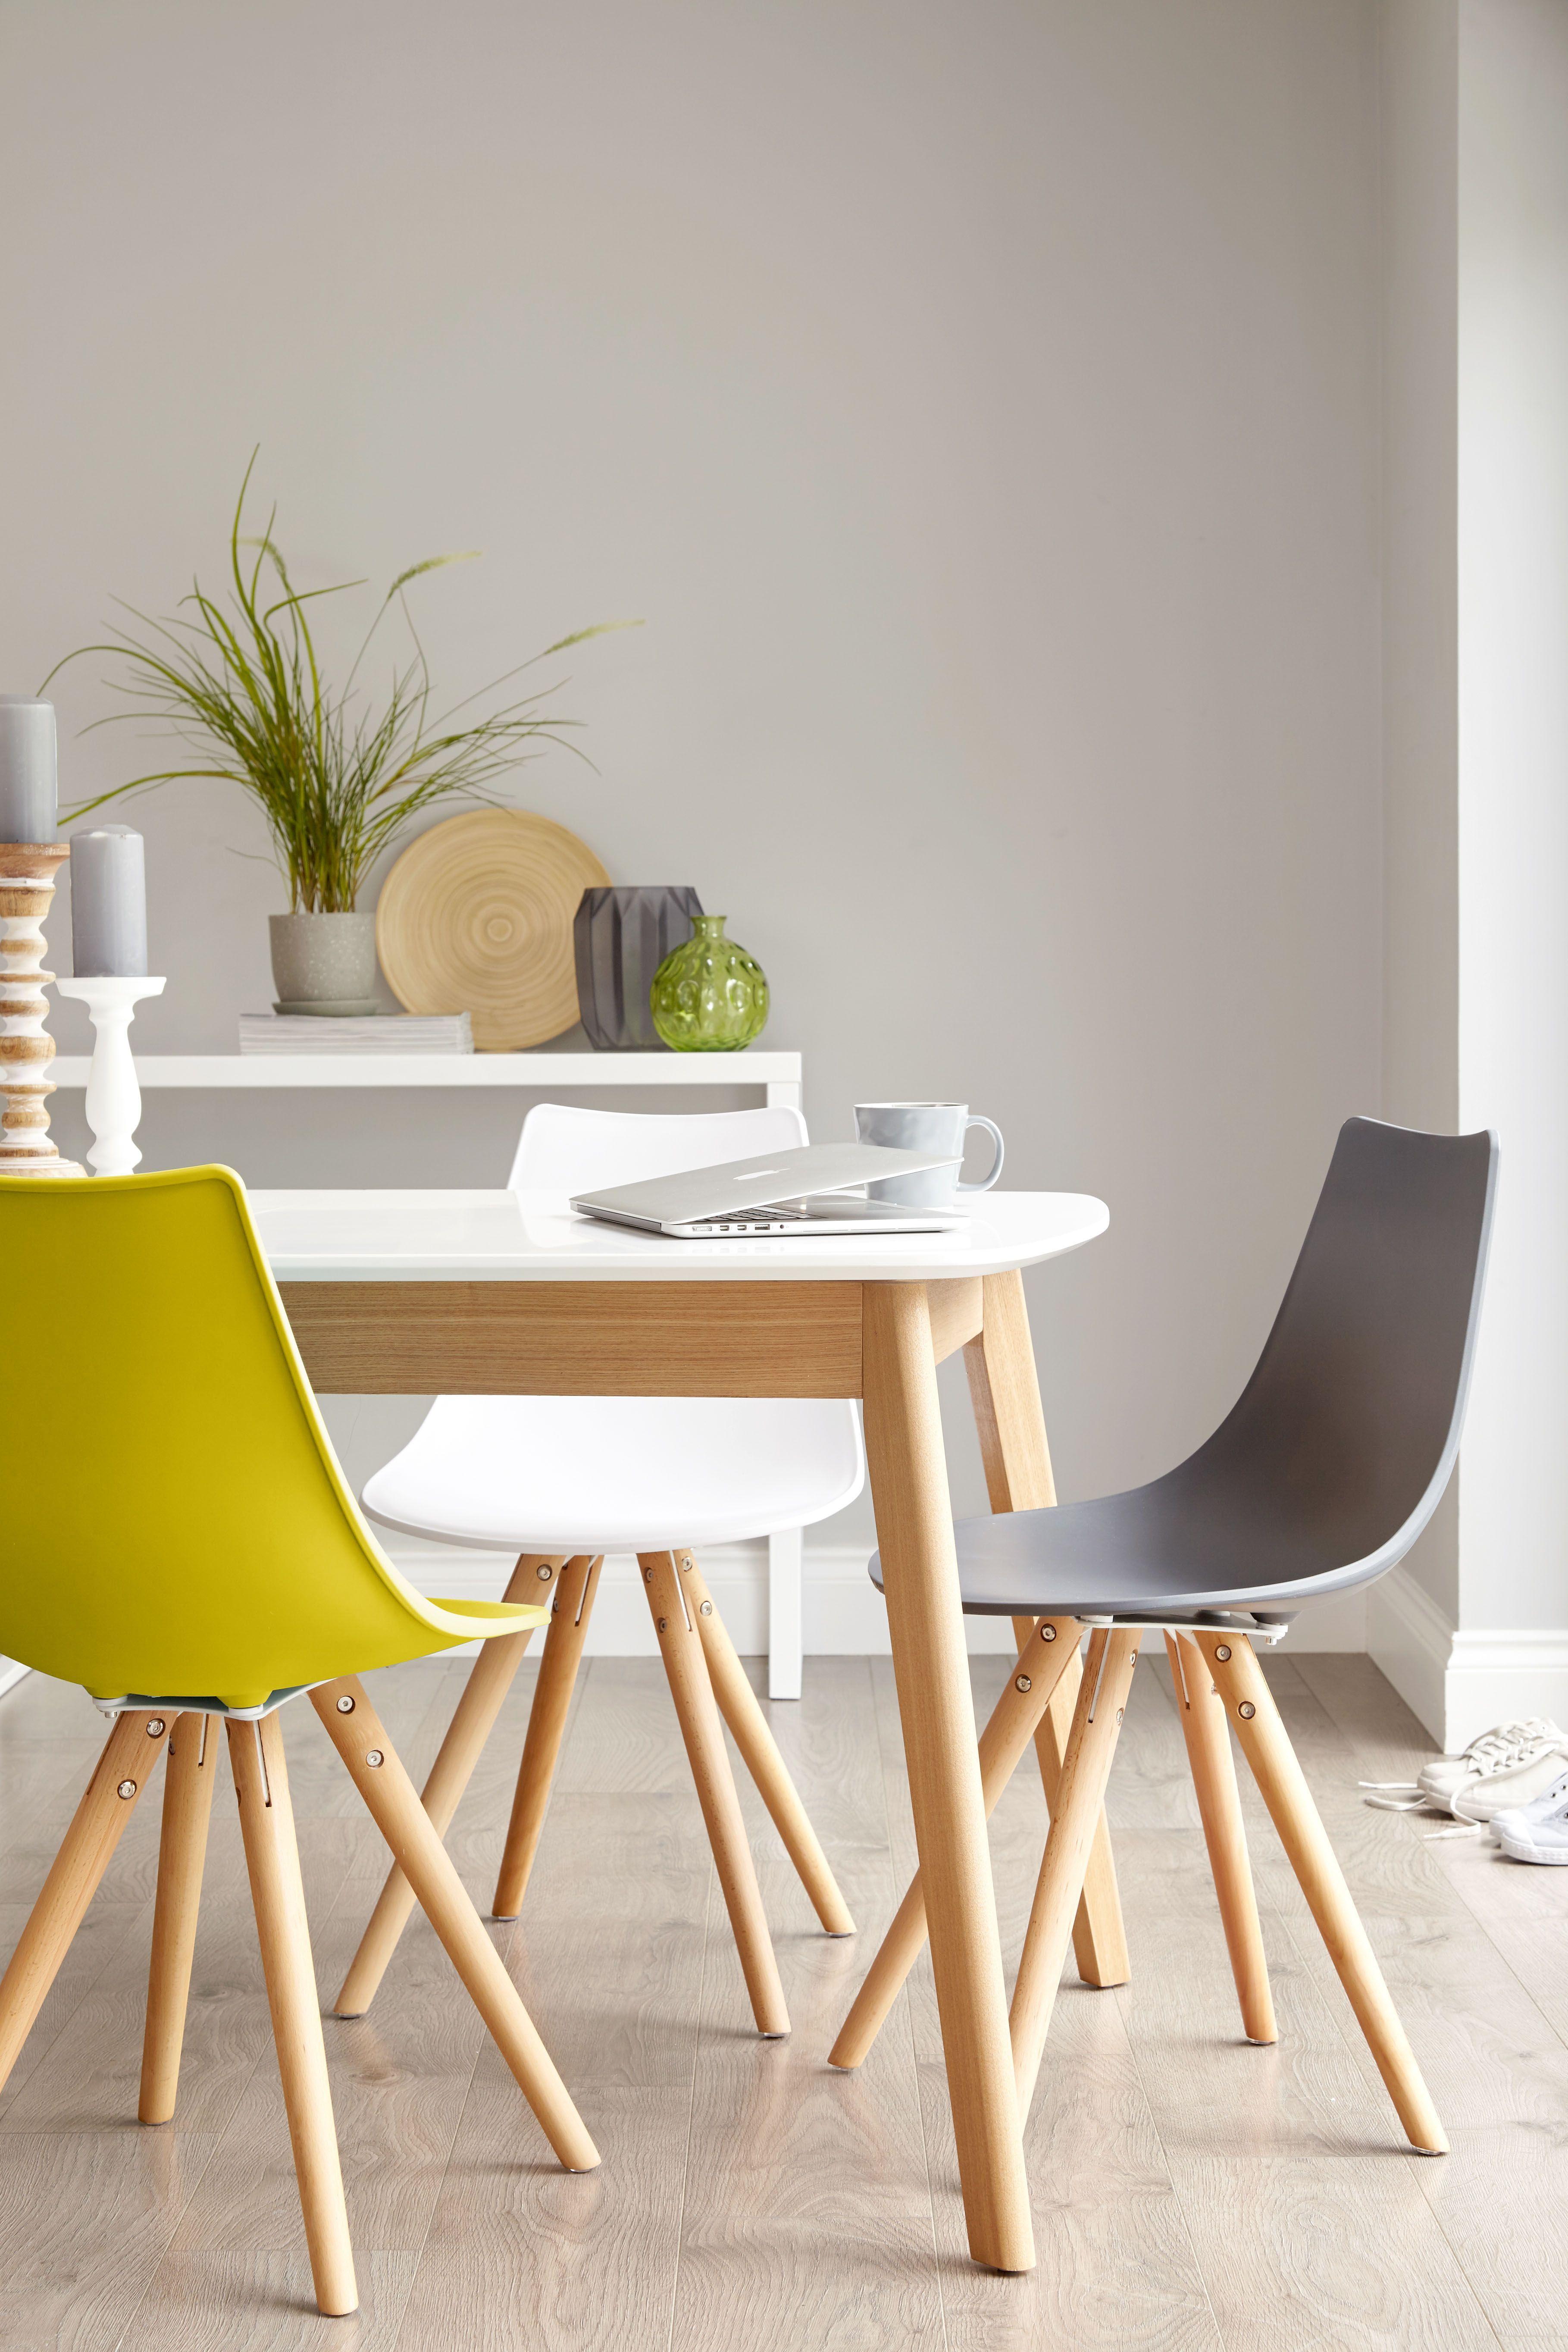 Aver White And Oak Extending Dining Table Diyfurnitureupcycle